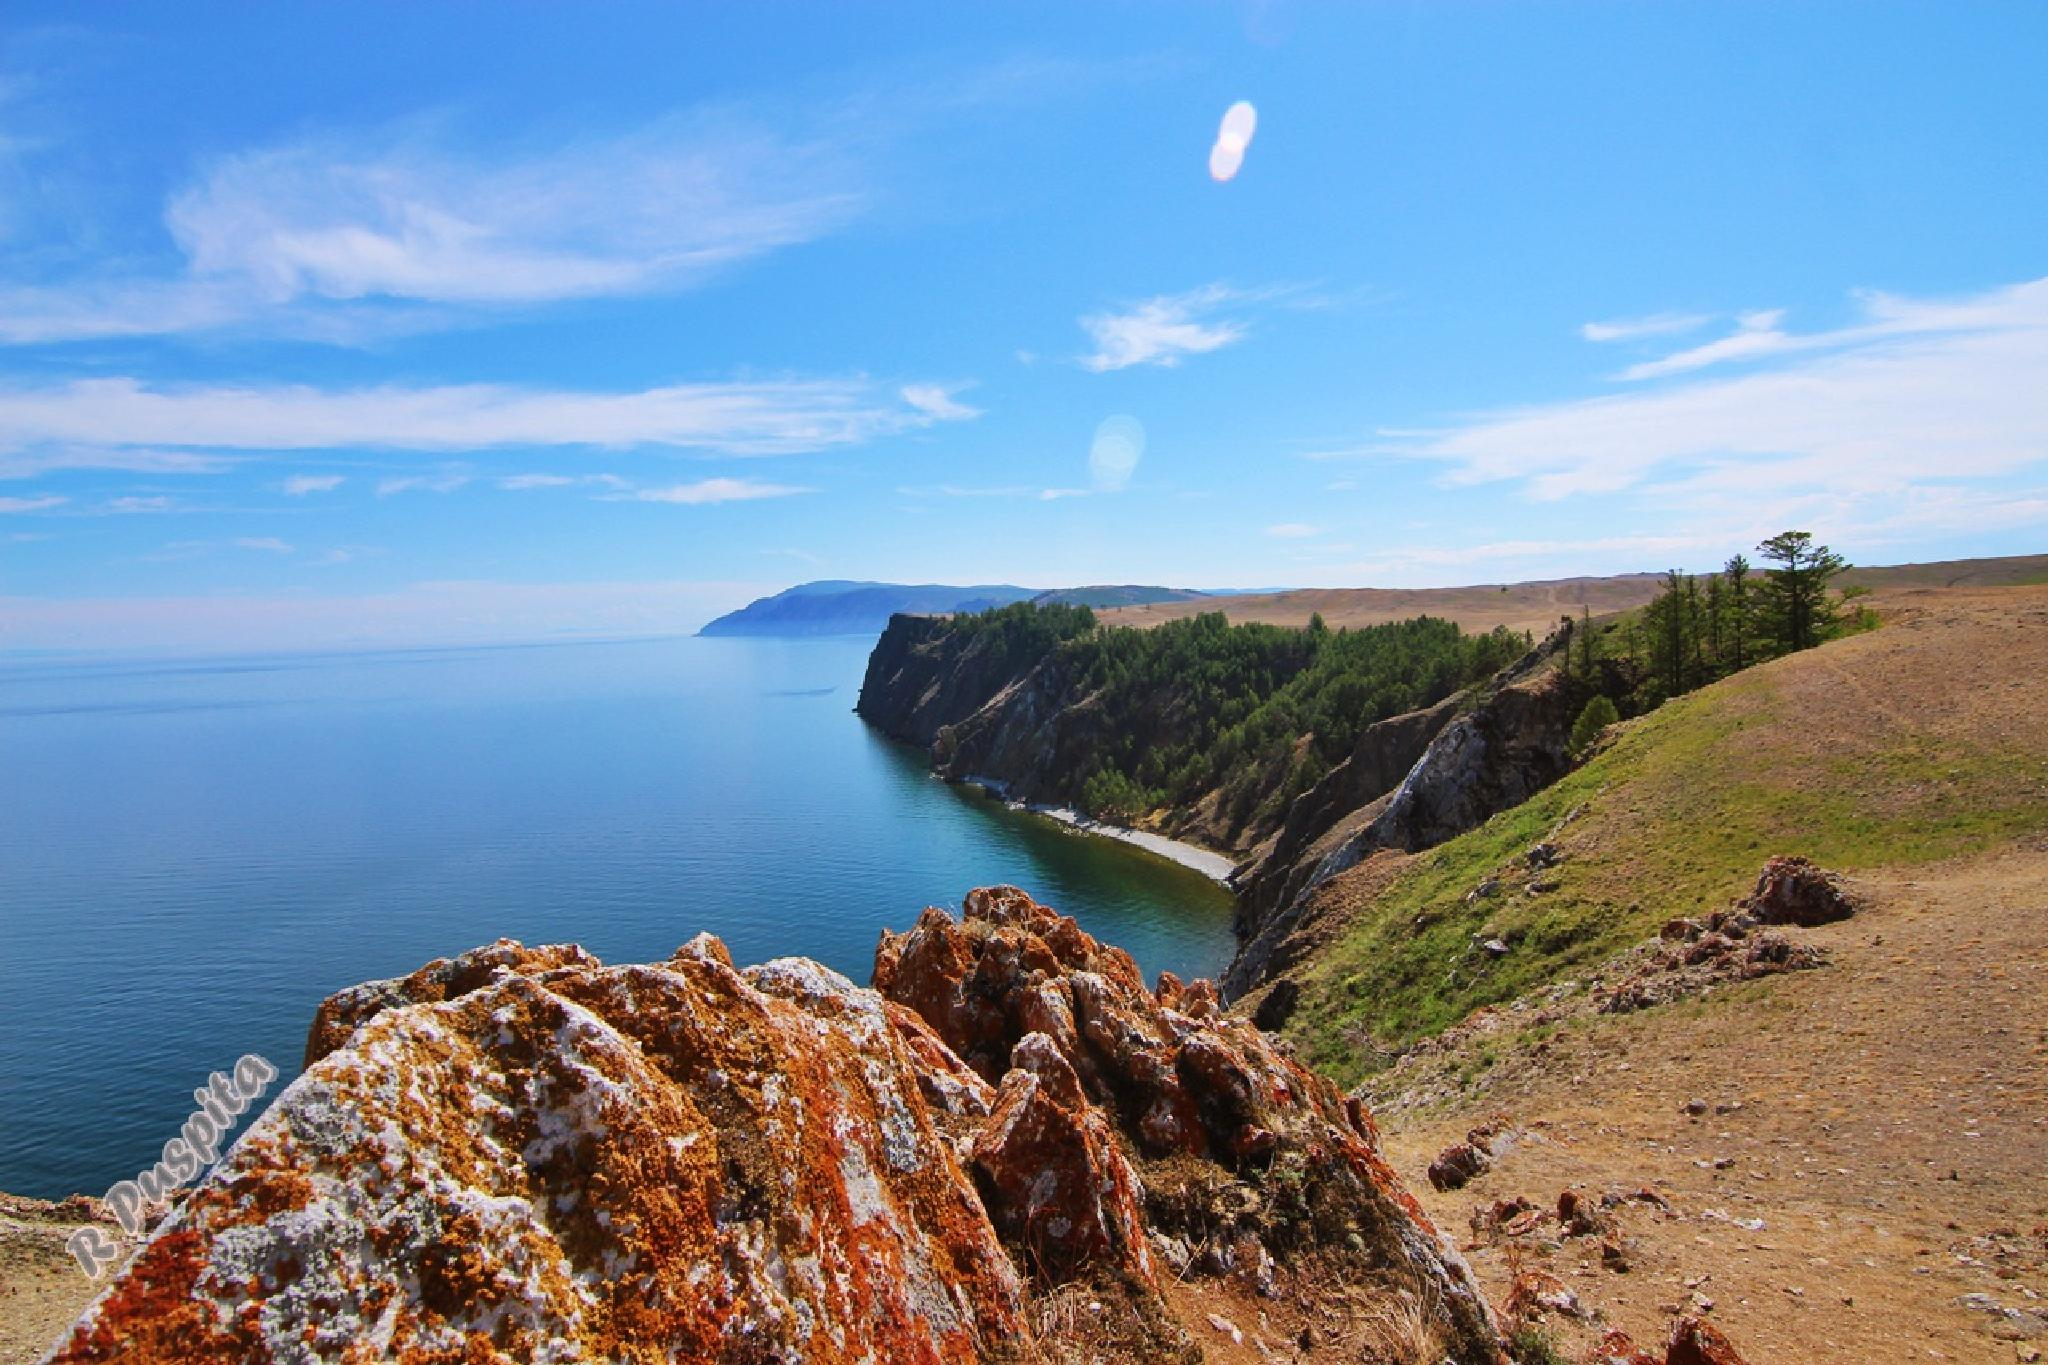 Lake Baikal, Ulan Ude by rennypuspita11